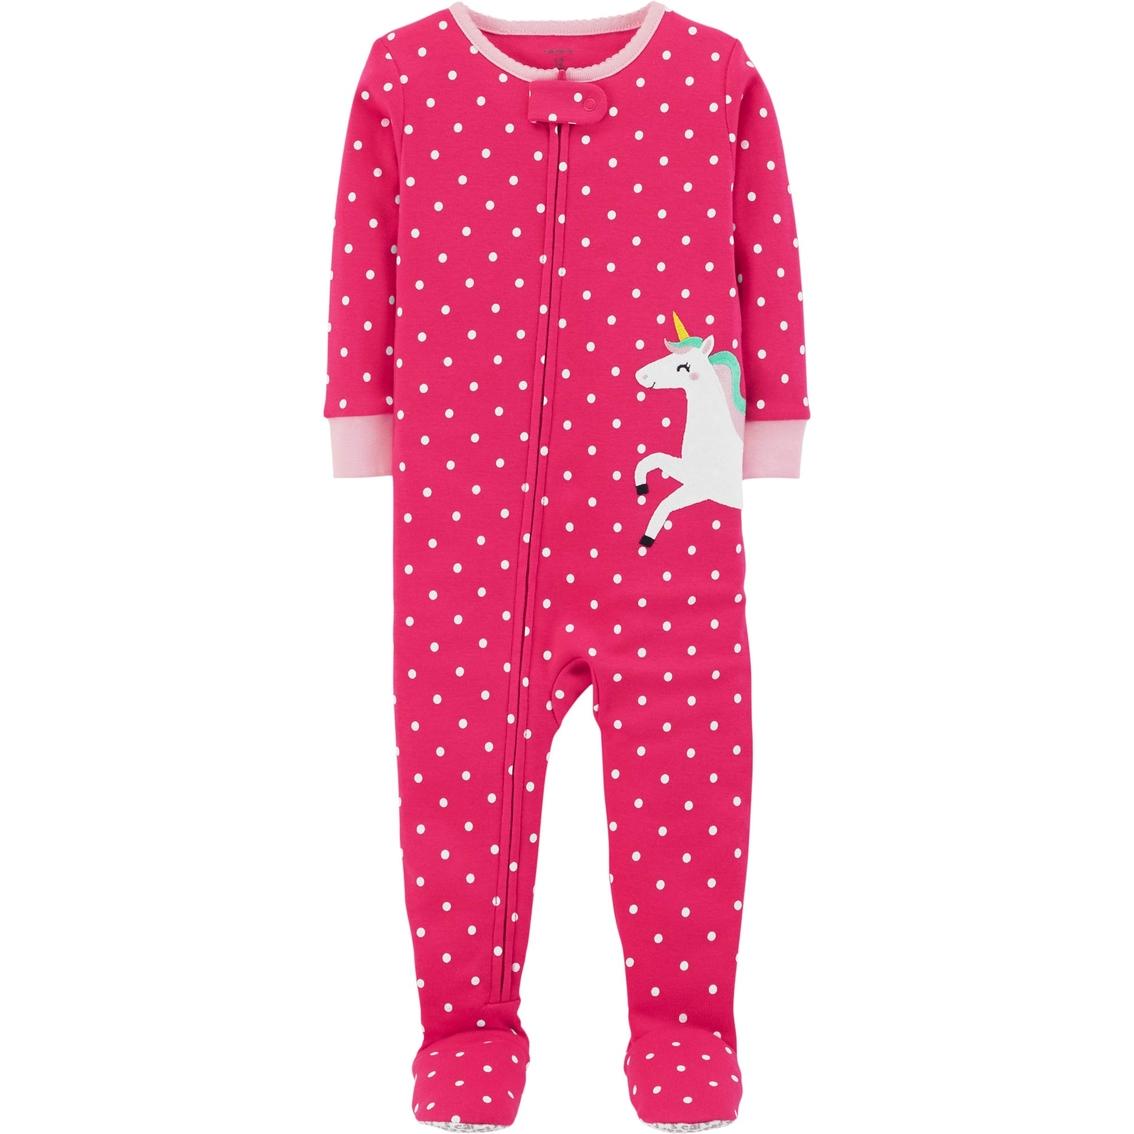 026bbdfa6 Carter s Infant Girls 1 Pc. Unicorn Polka Dot Snug Fit Pajamas ...